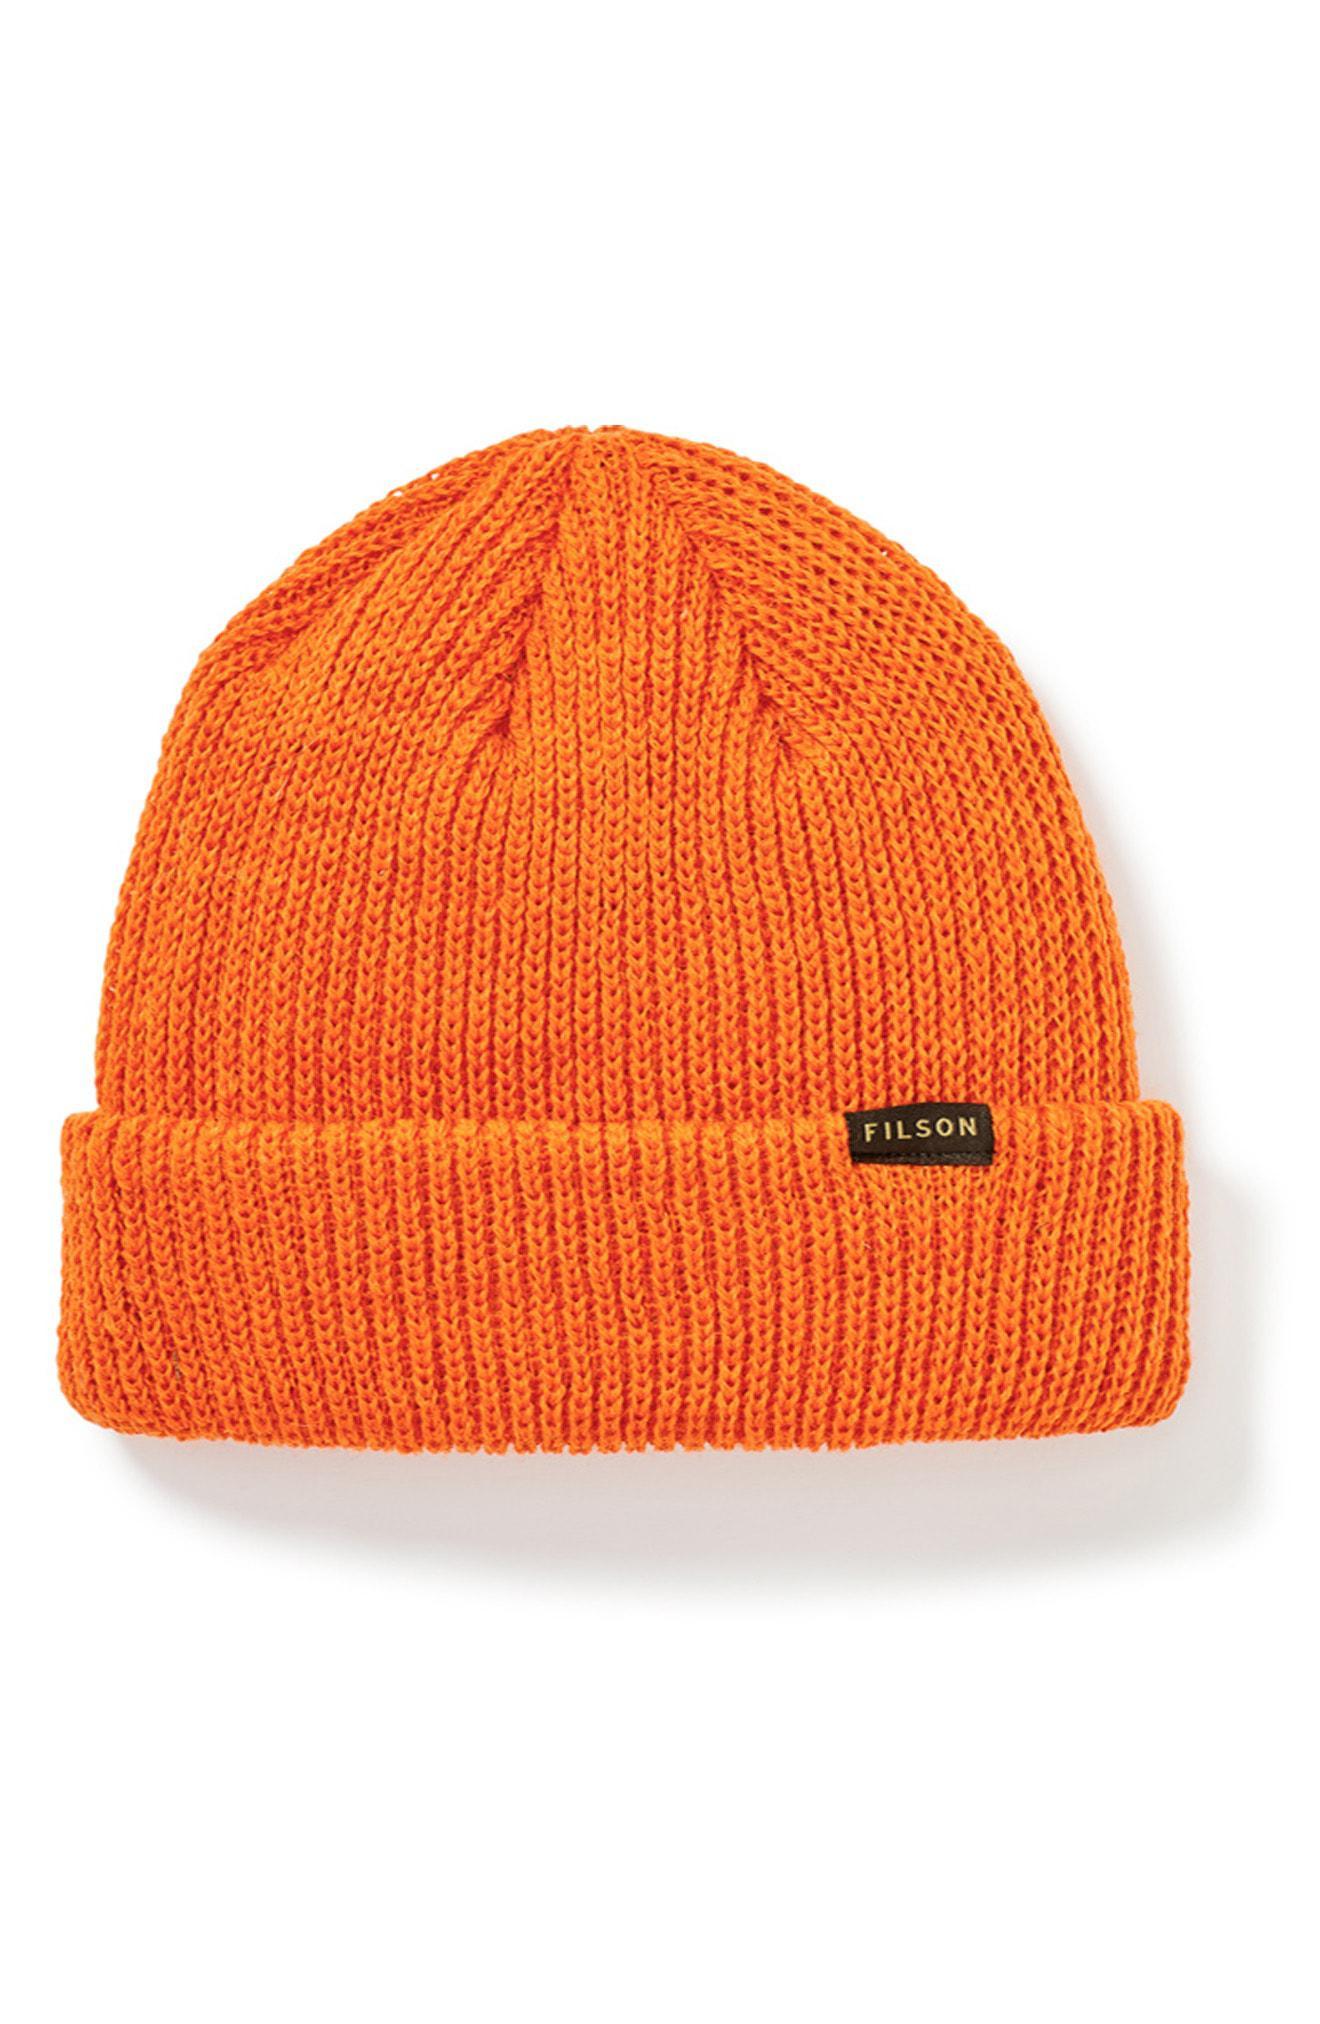 9e3905936c4 Filson - Orange Wool Watch Cap for Men - Lyst. View fullscreen